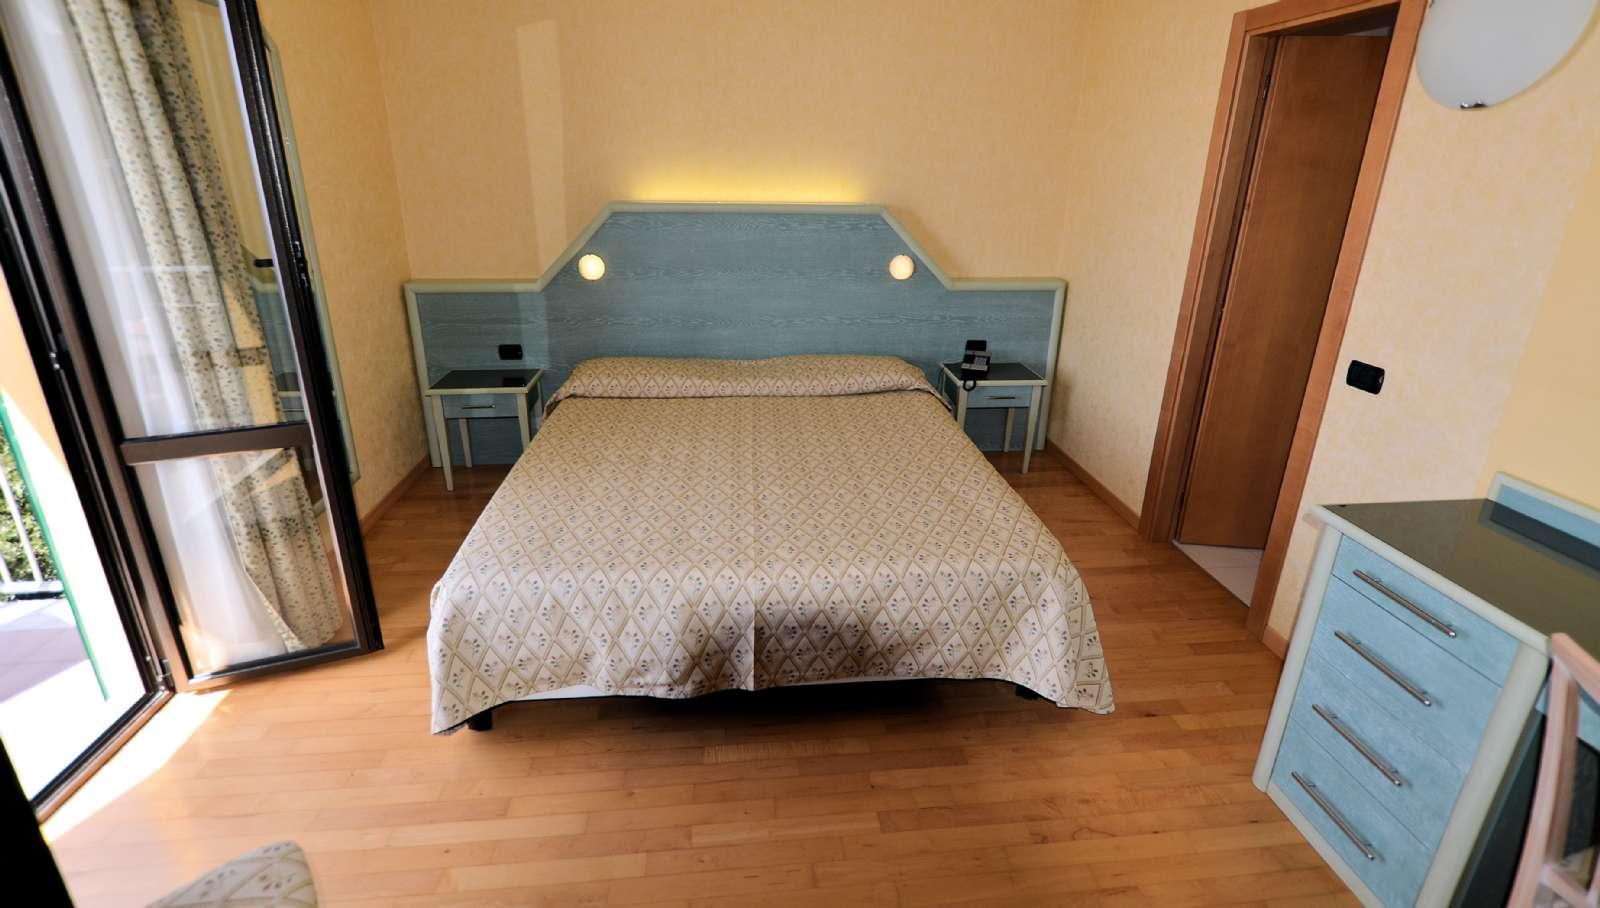 Room example